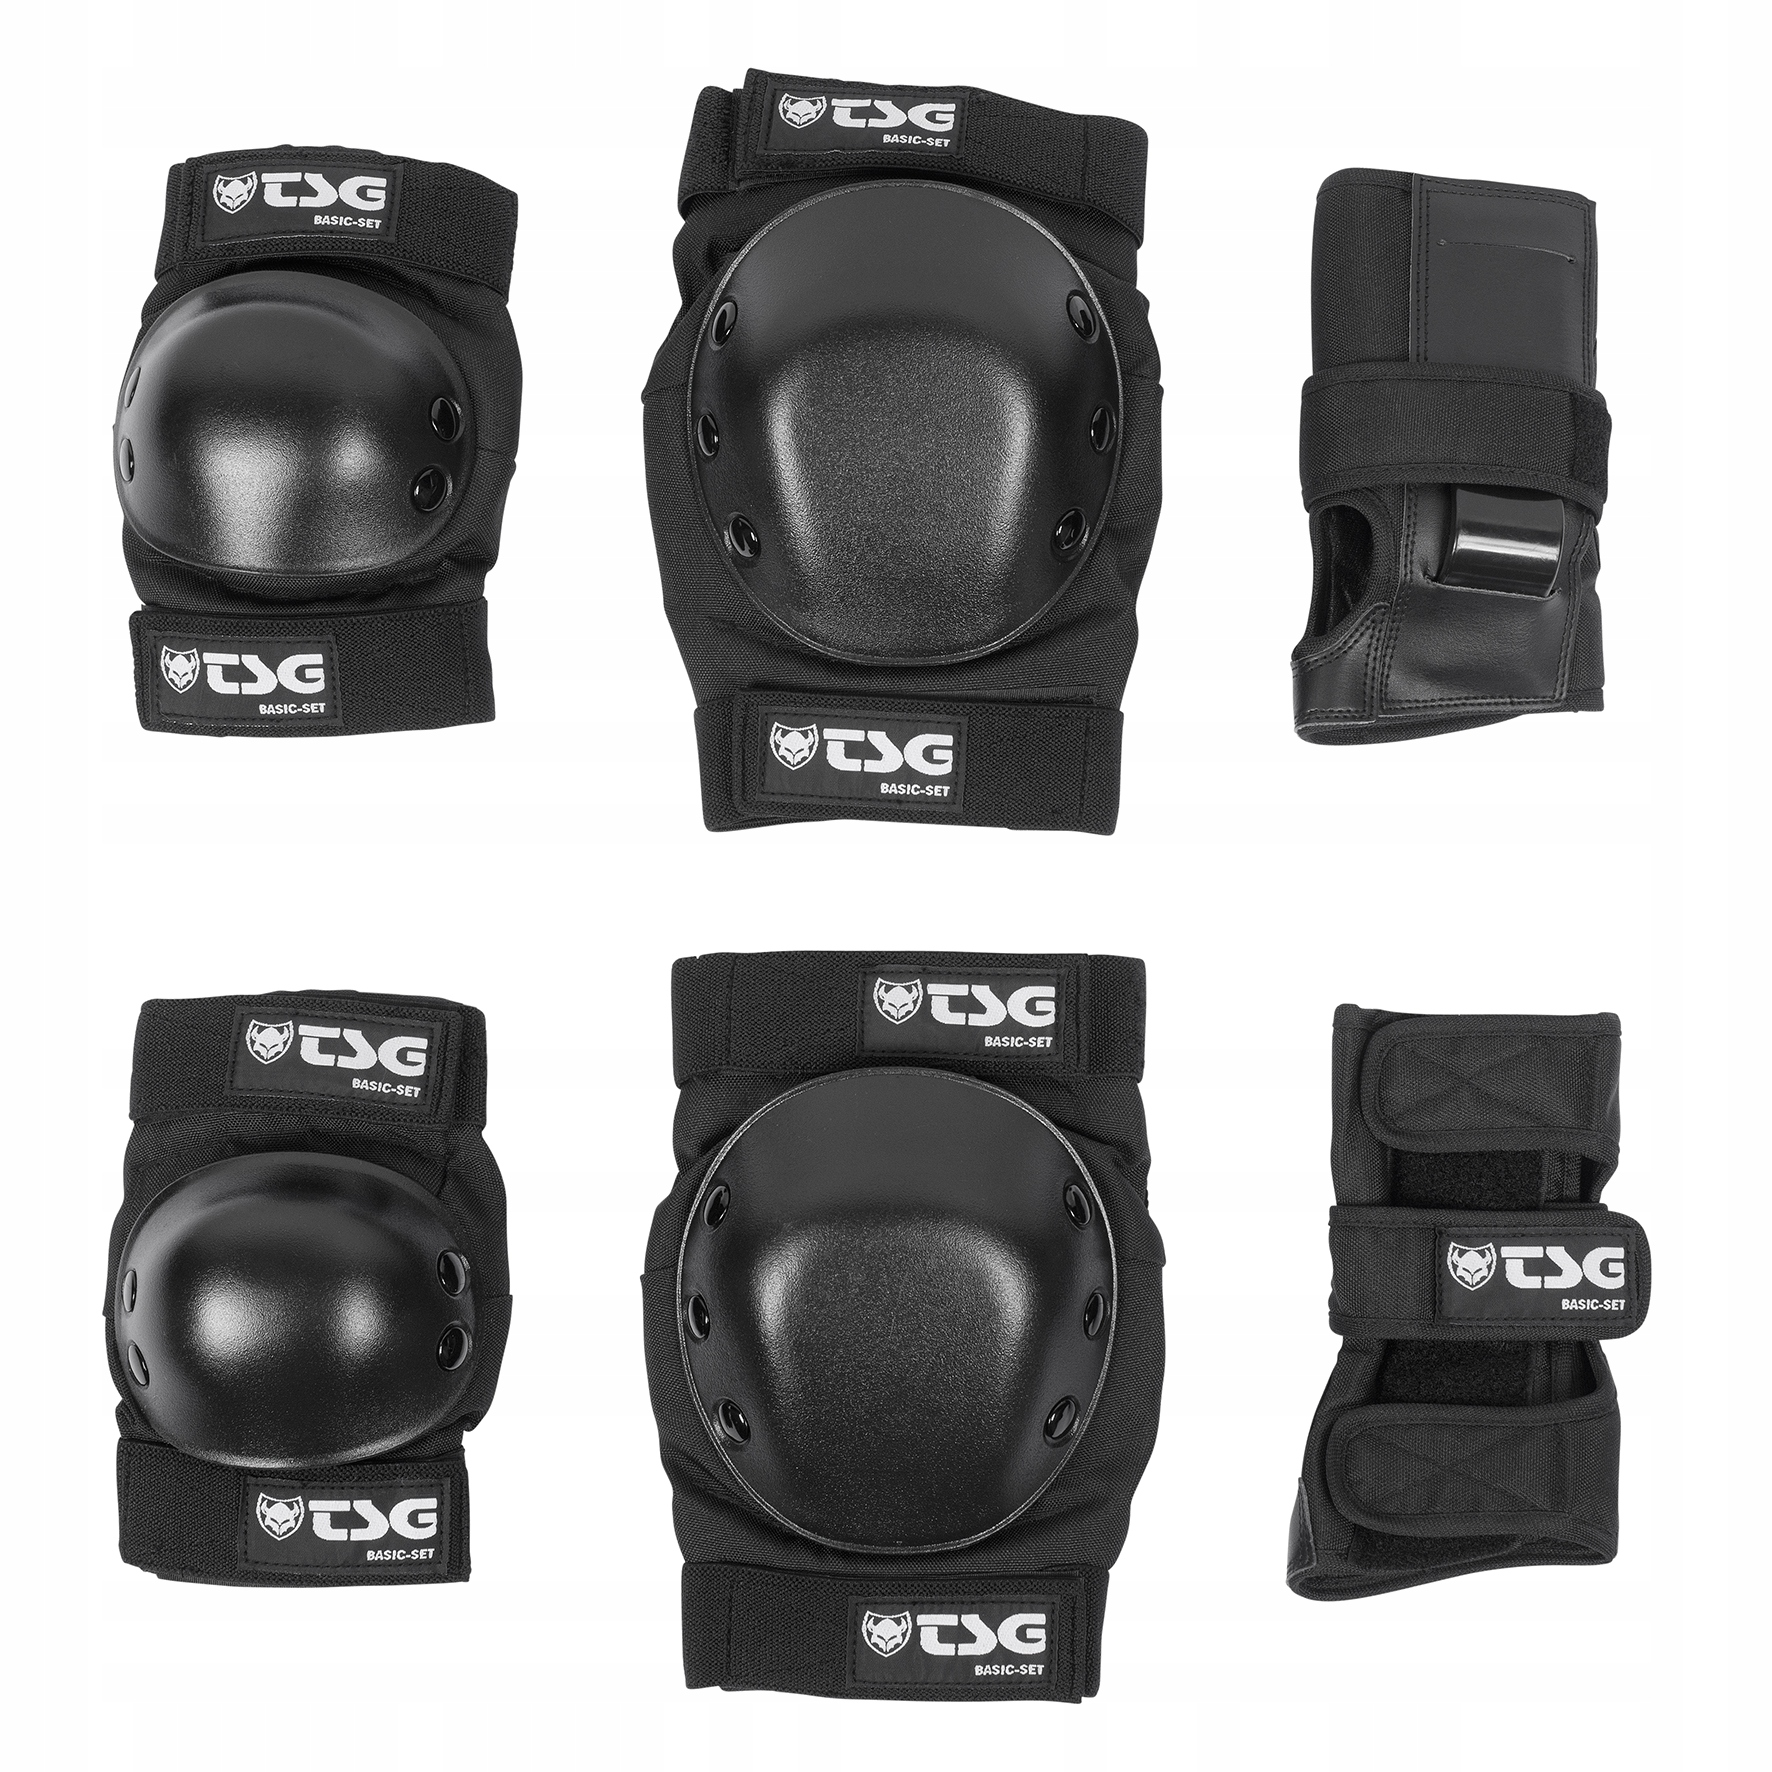 TSG zestaw ochraniaczy BASIC SET black rozmiar M